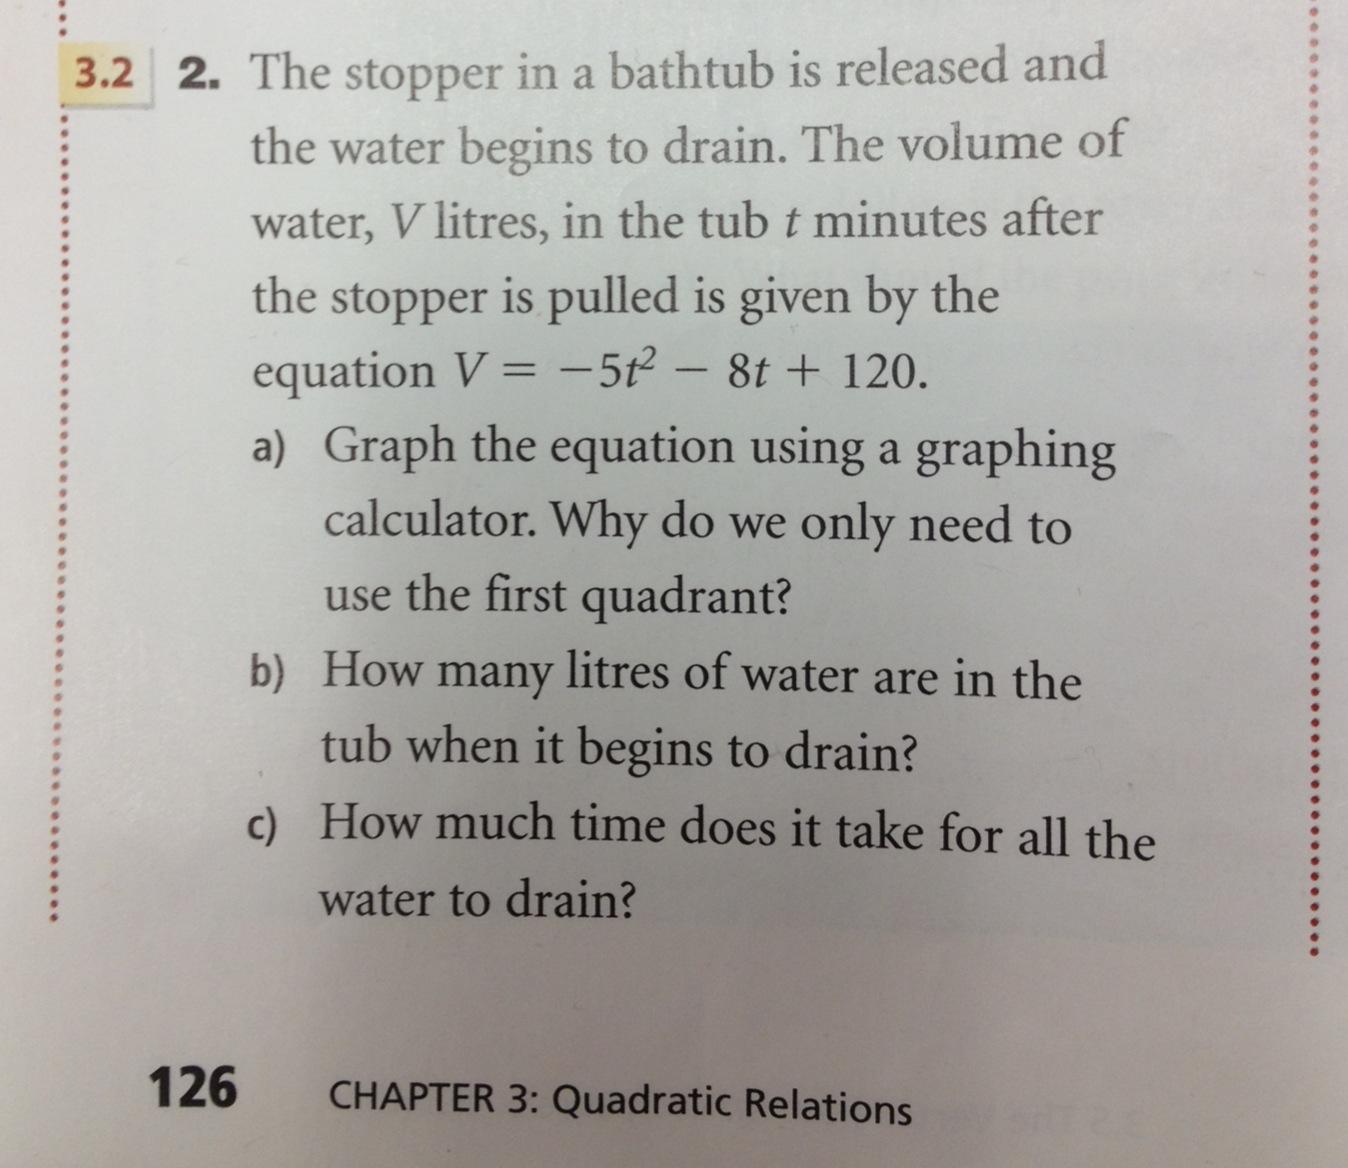 Workbooks nelson math grade 5 workbook : need math help ... grade 11 mathematics, Ontario, Canada